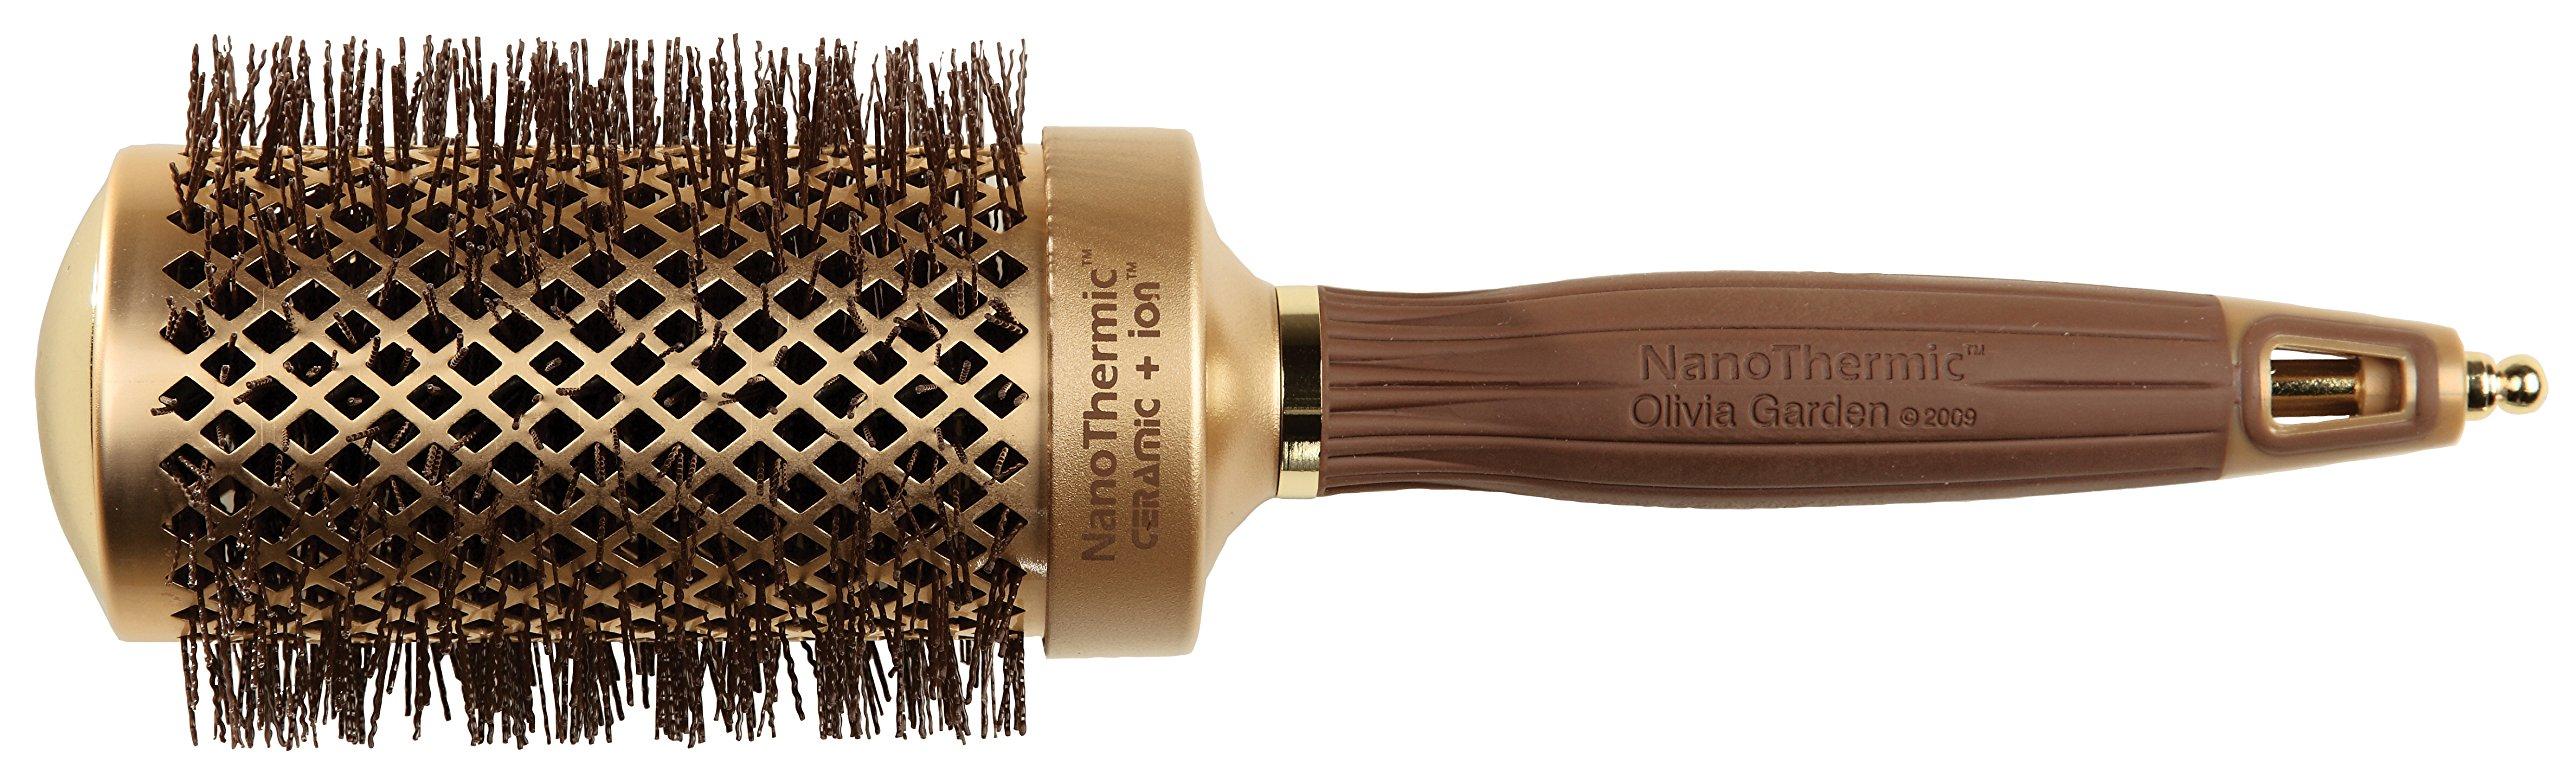 Olivia Garden NT-54 NanoThermic Ceramic + Ion Round Thermal Hair Brush (2 1/8'')